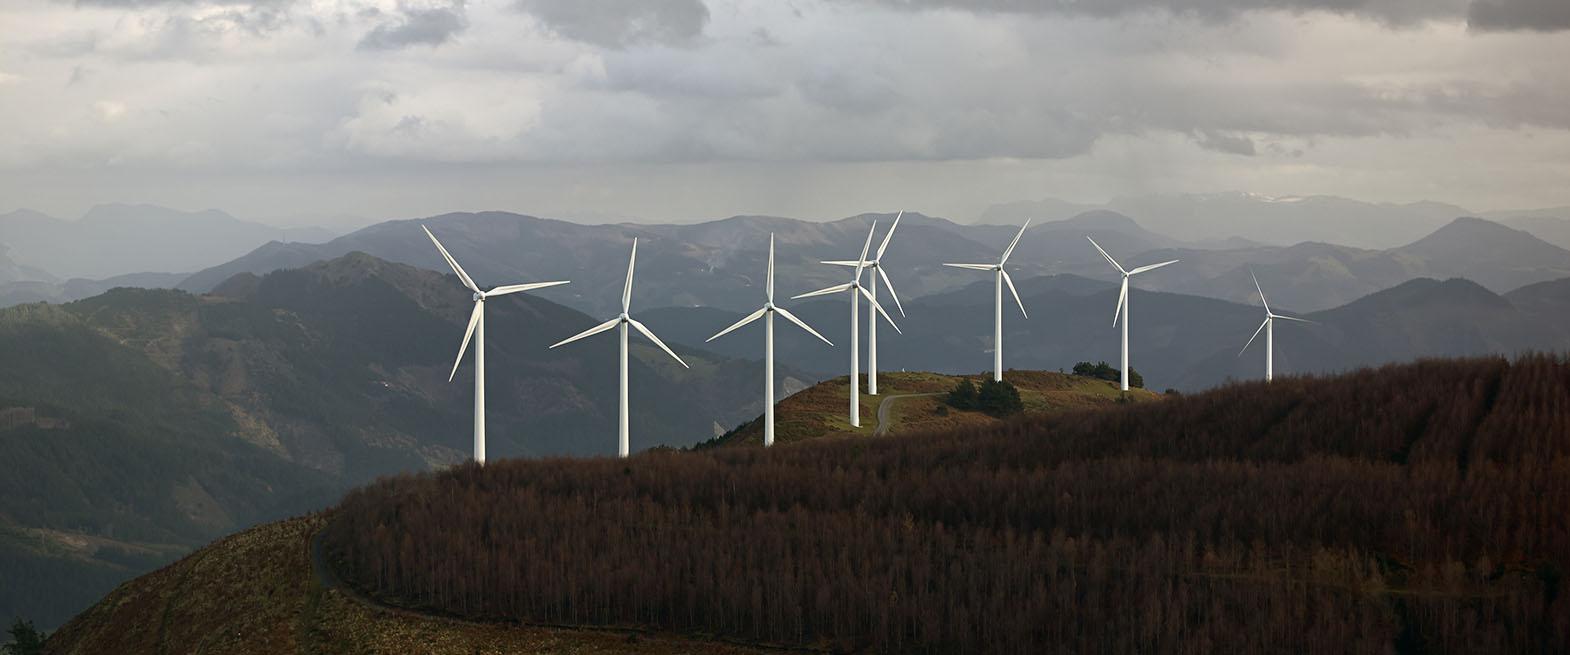 RenewableEnergy_Slide2